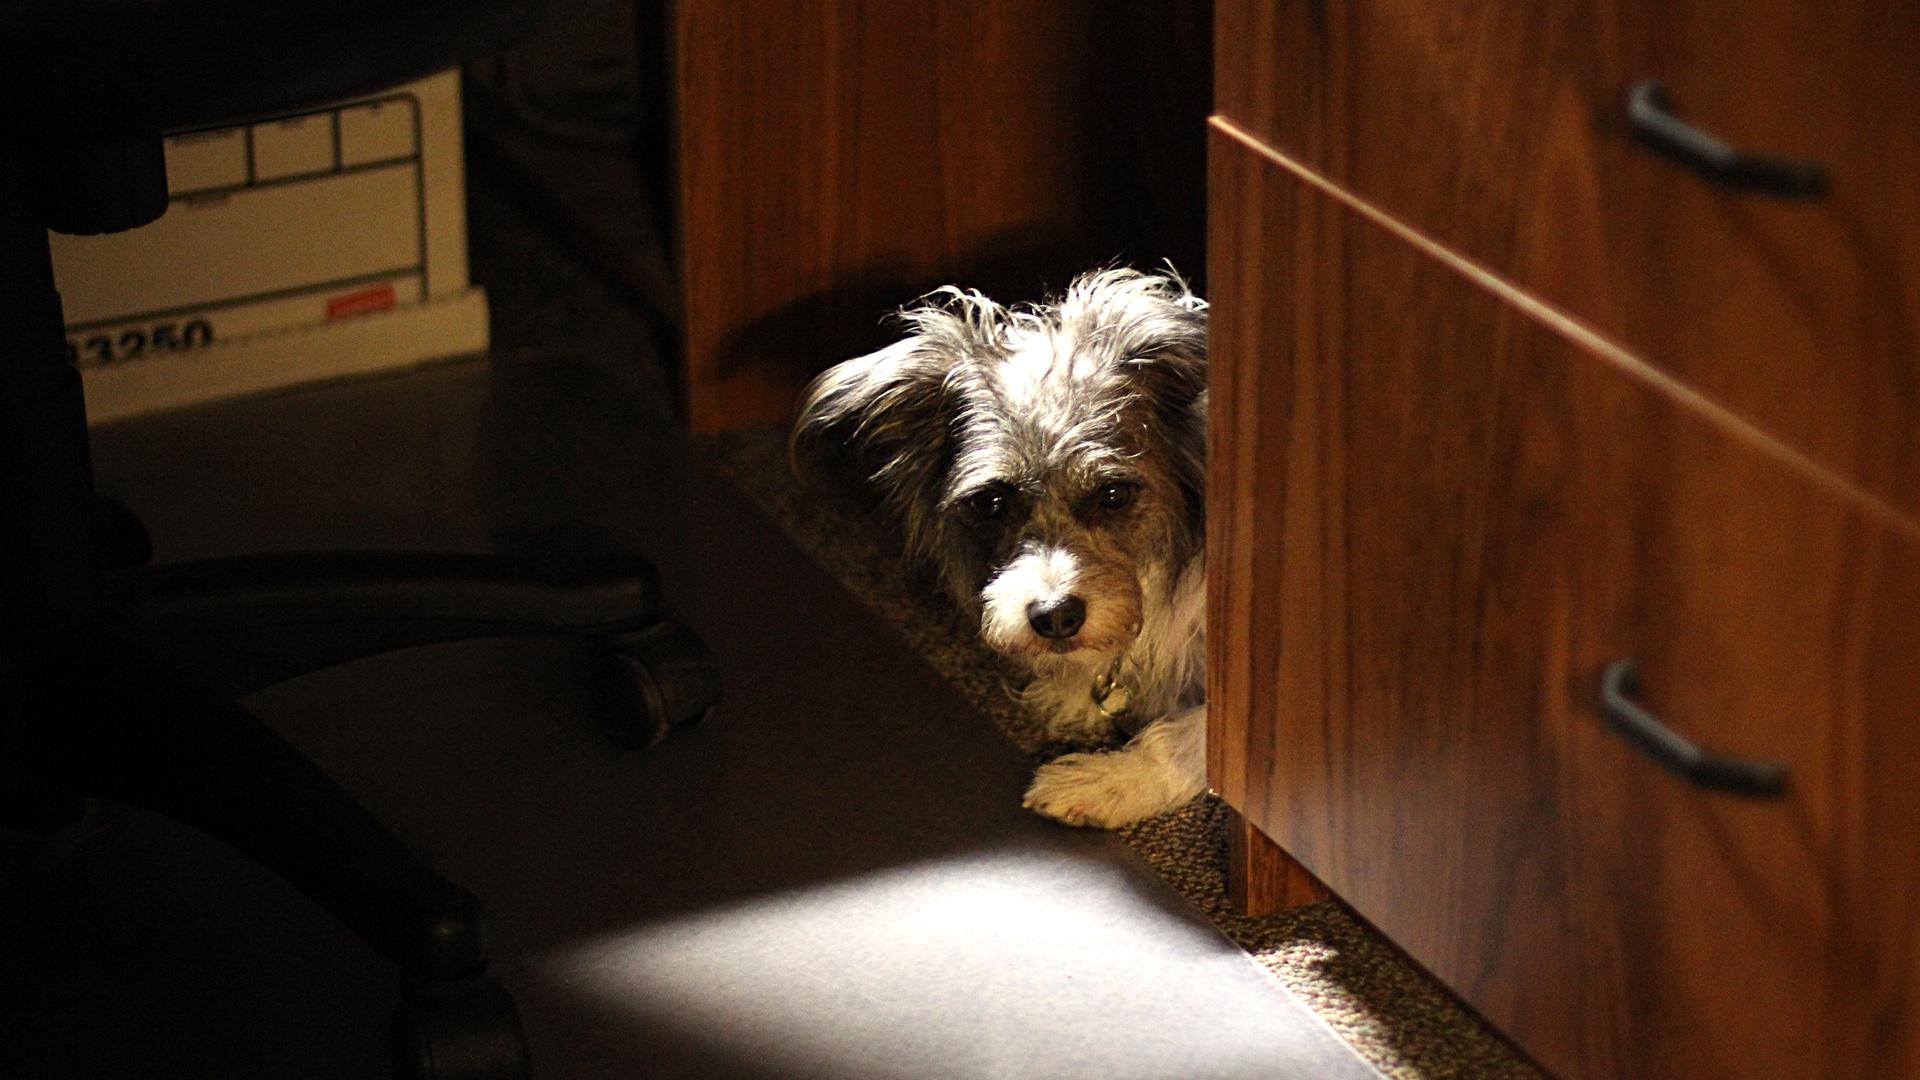 Pinto's hiding place